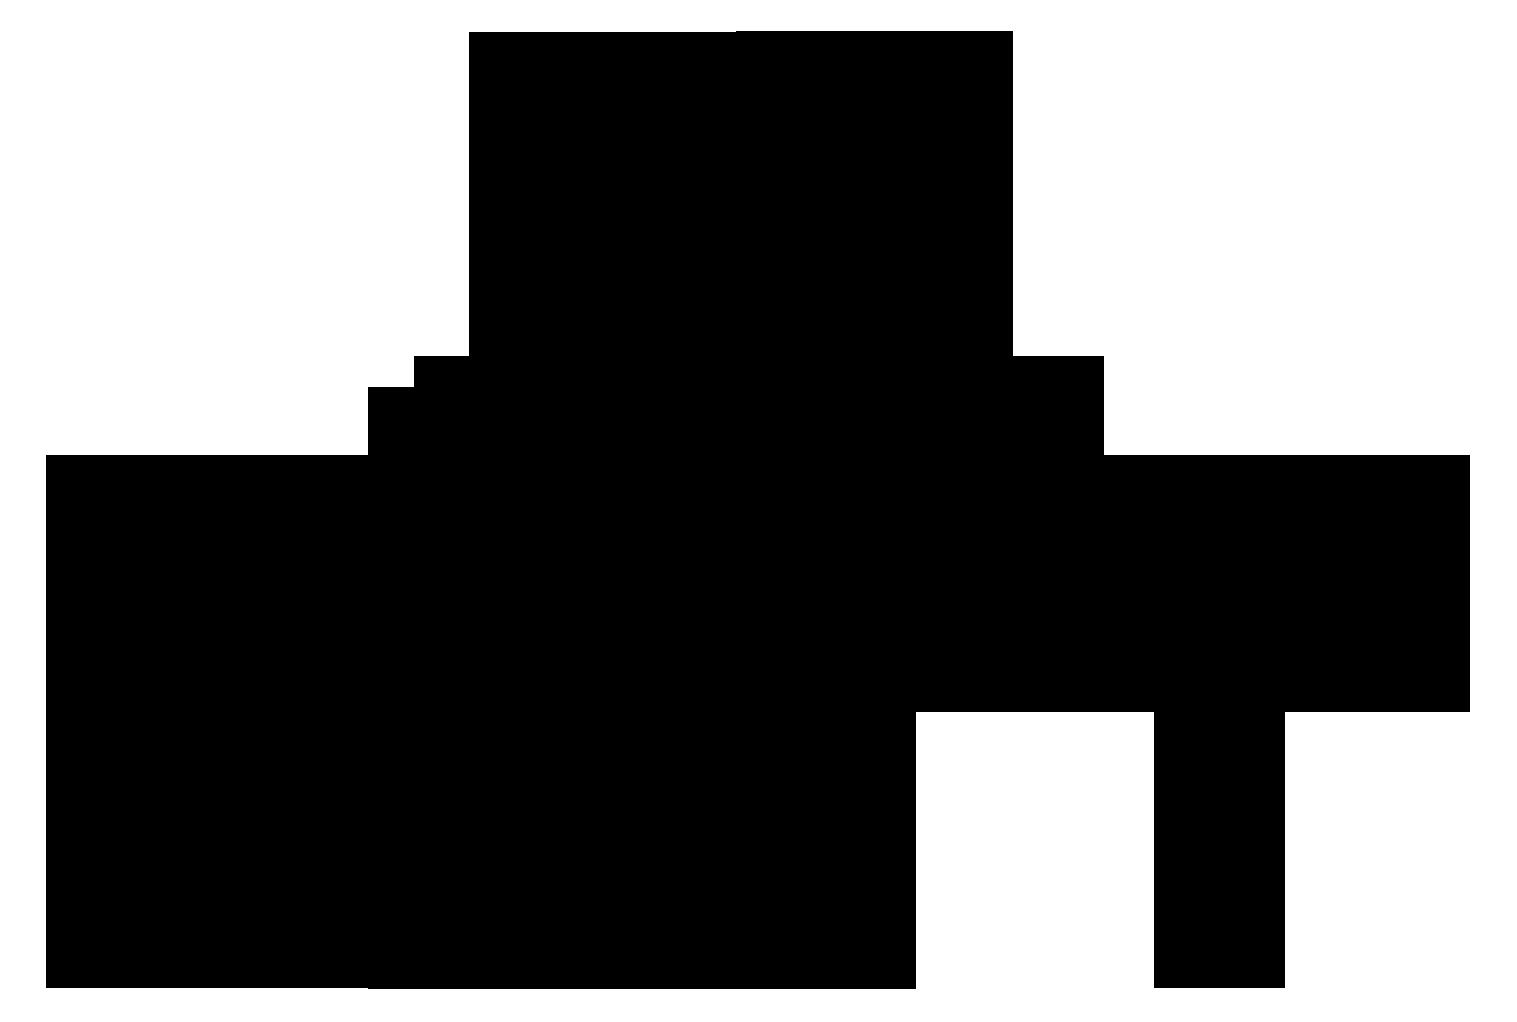 cuero-logo-rvt